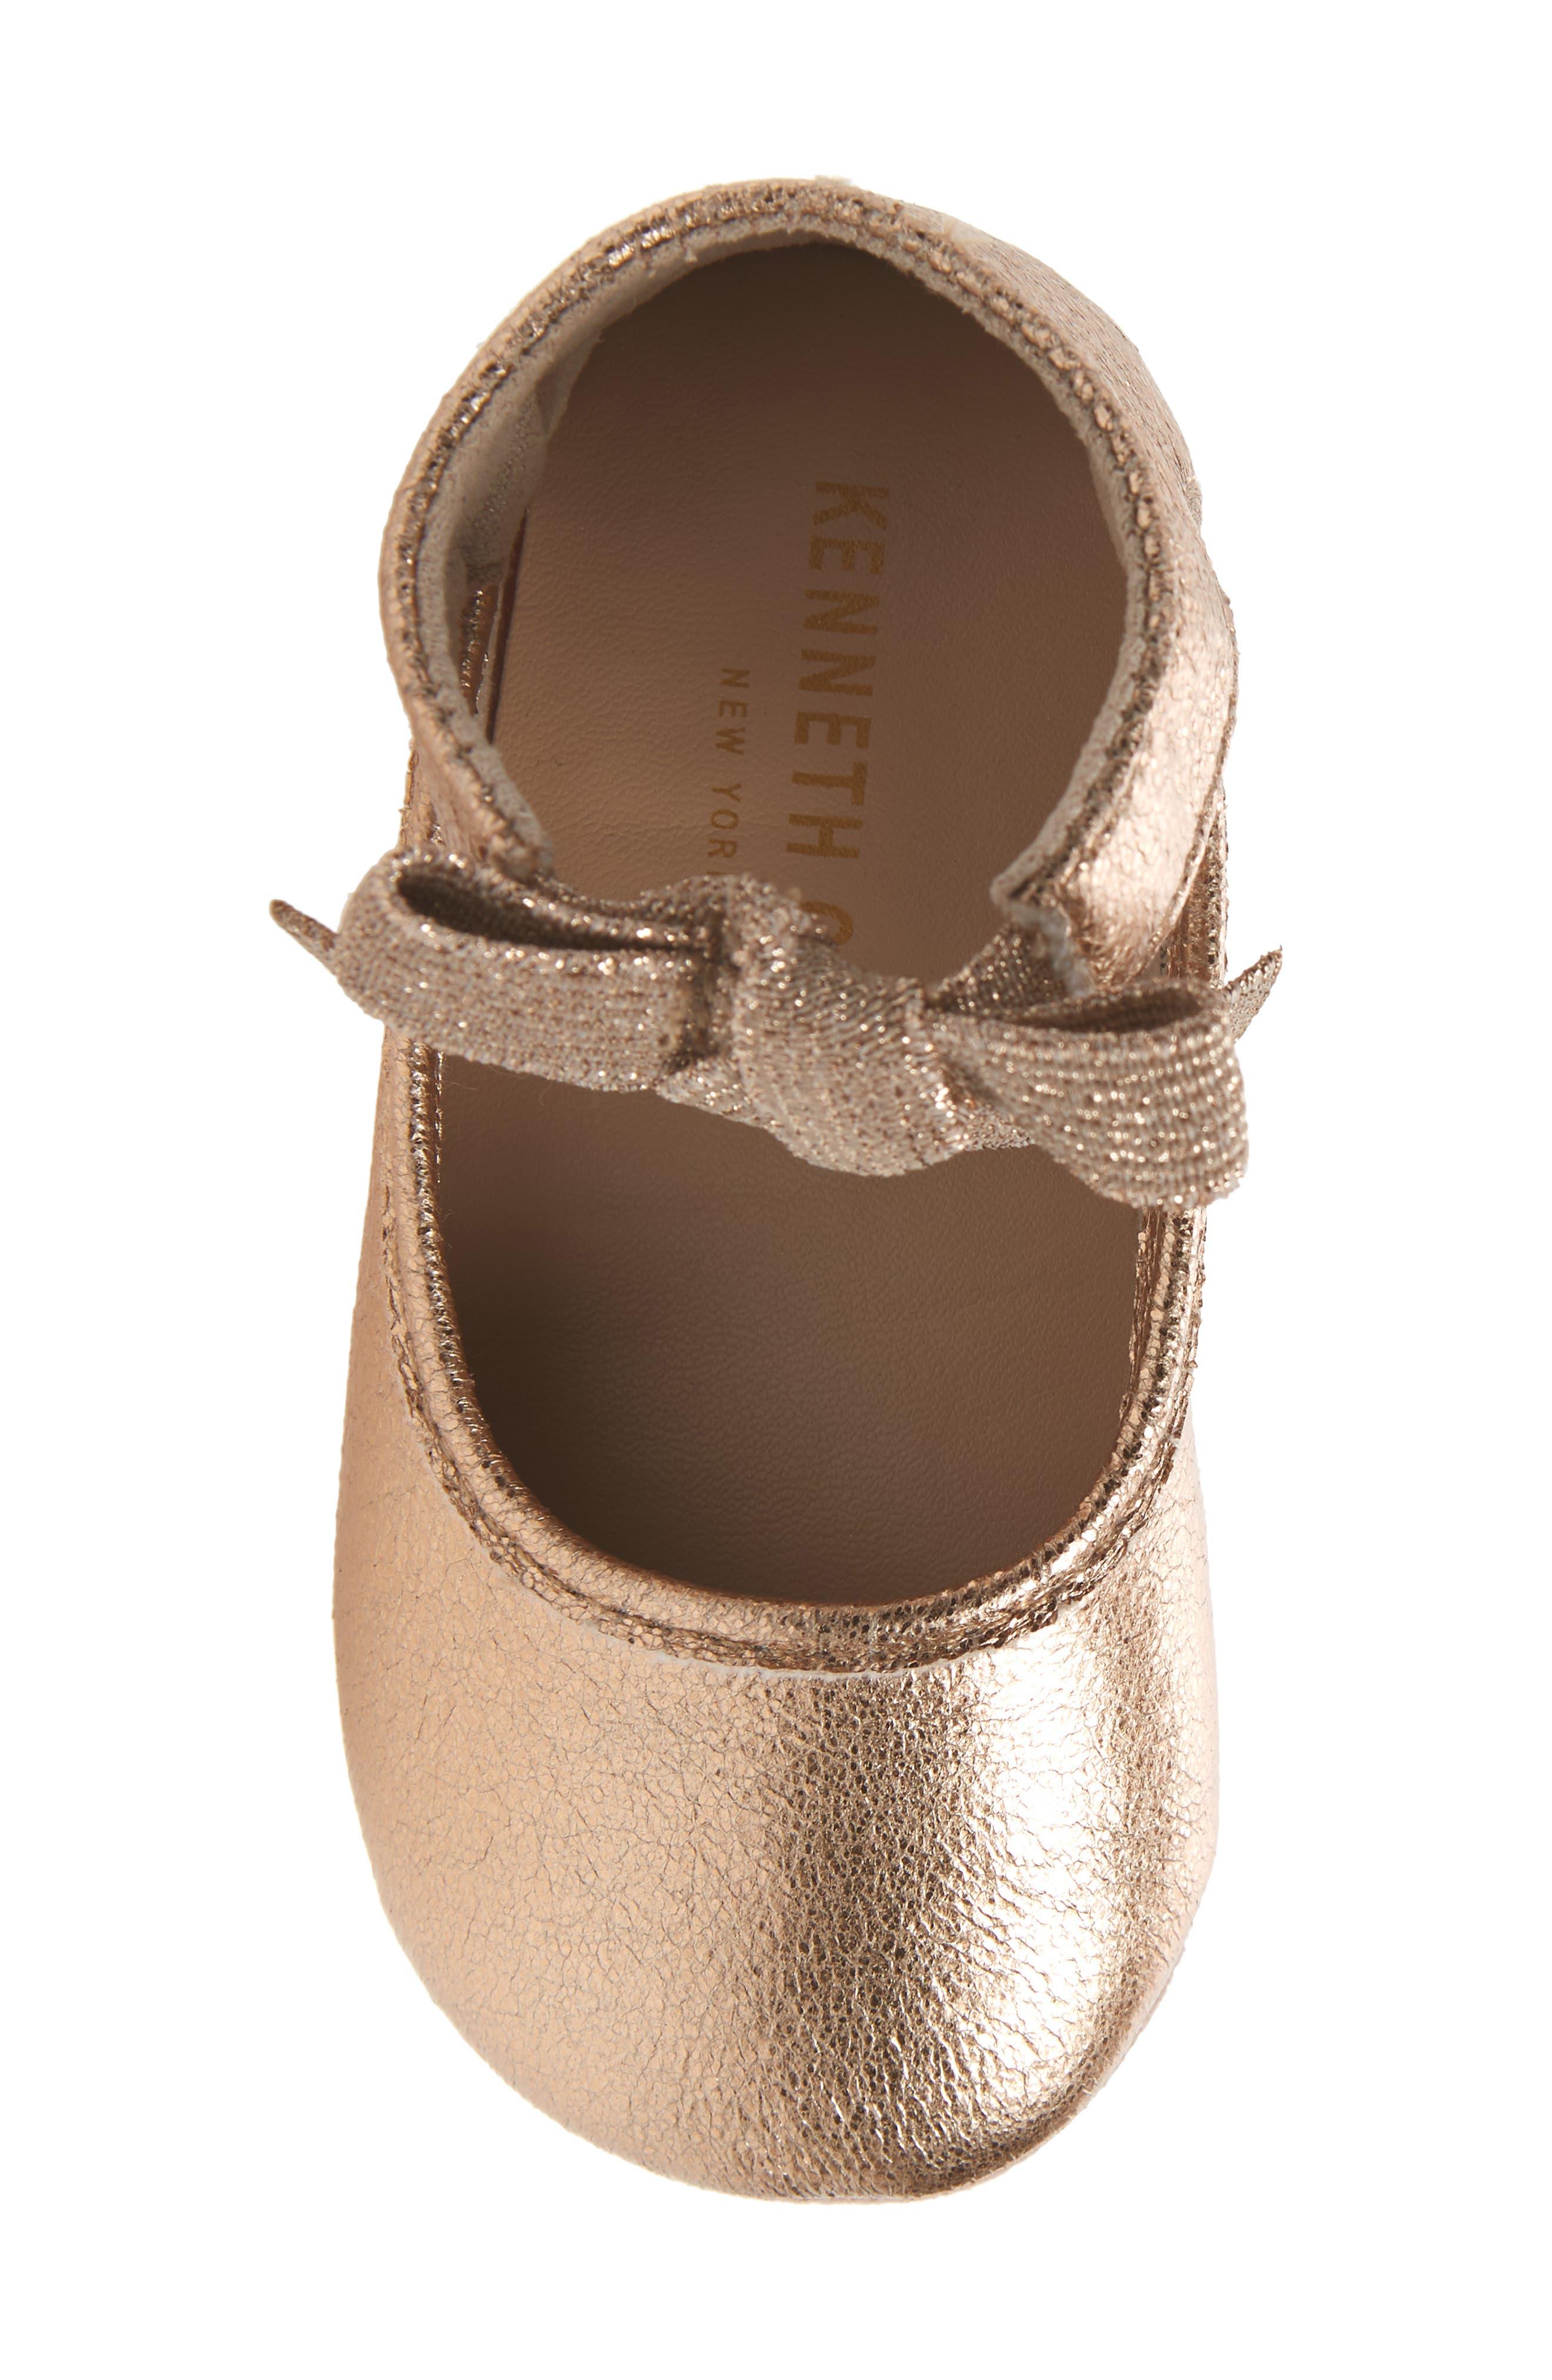 KENNETH COLE NEW YORK, Rose Bow Metallic Ballet Flat, Alternate thumbnail 5, color, ROSE